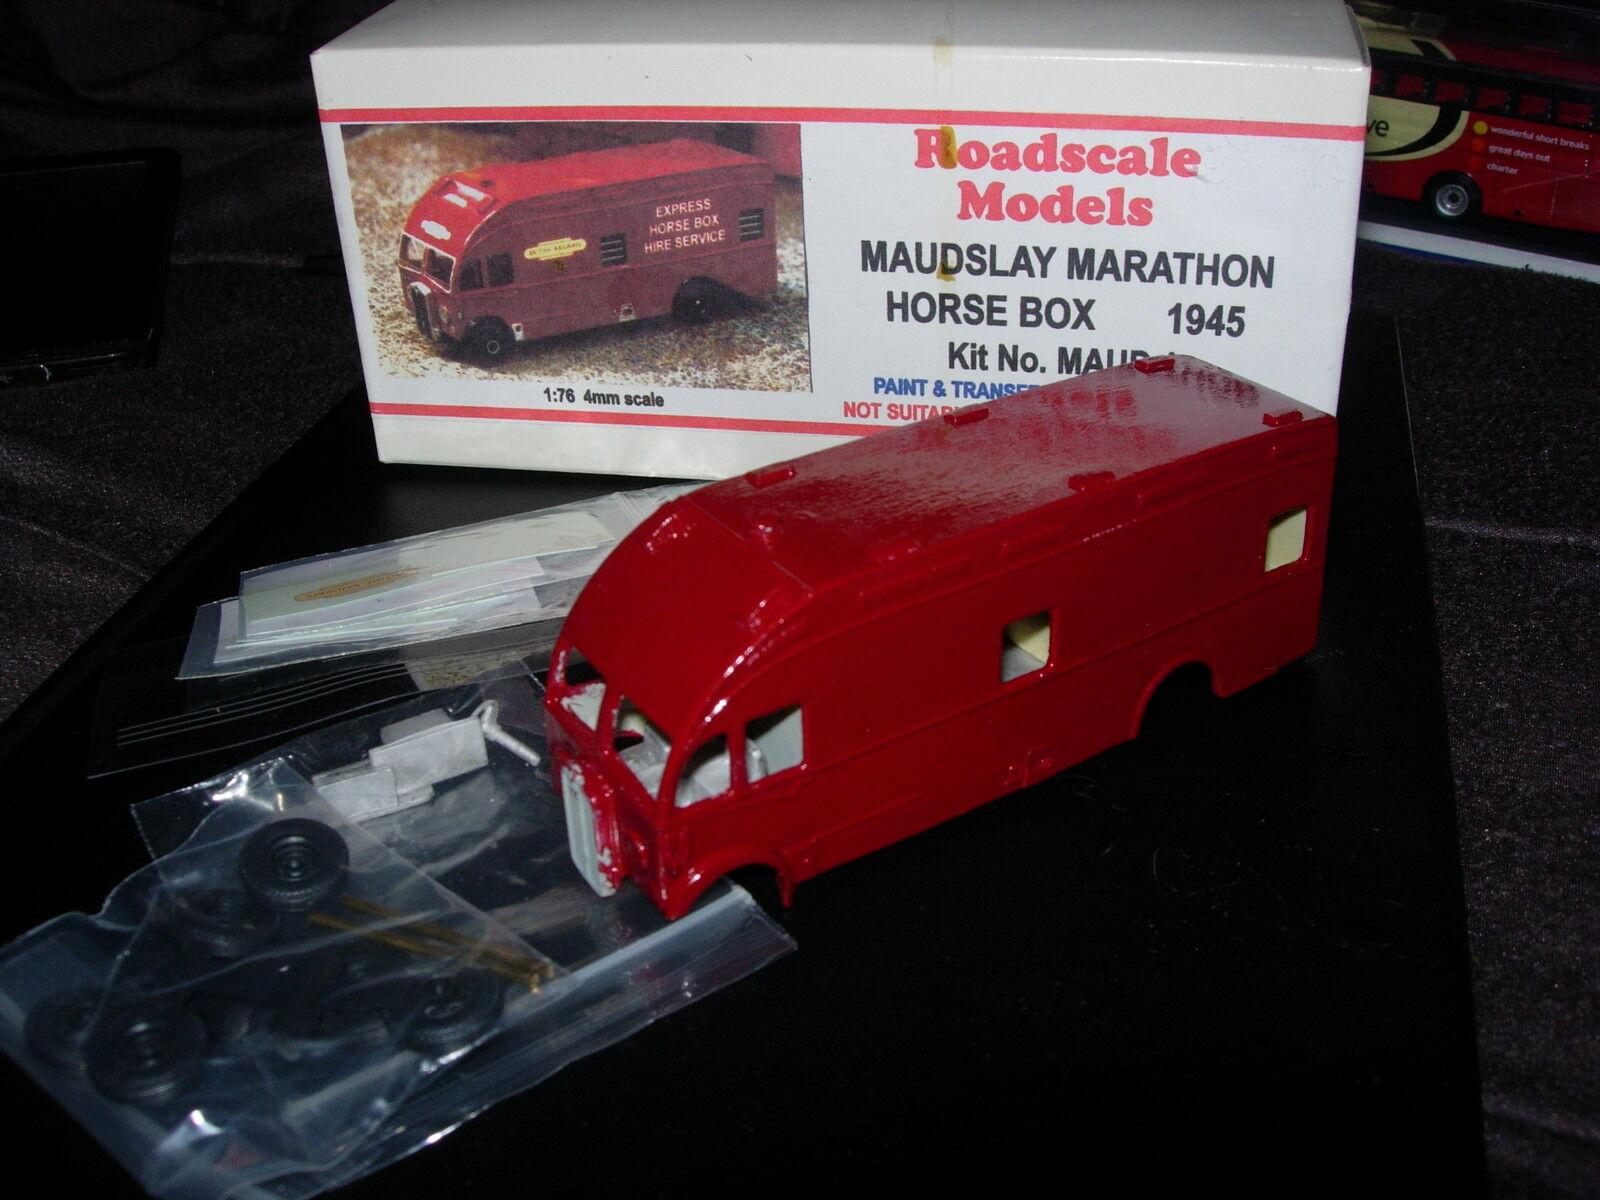 ROADSCALE MODELS MAUDSLEY MARATHON 1945 1 76 SCALE RESIN